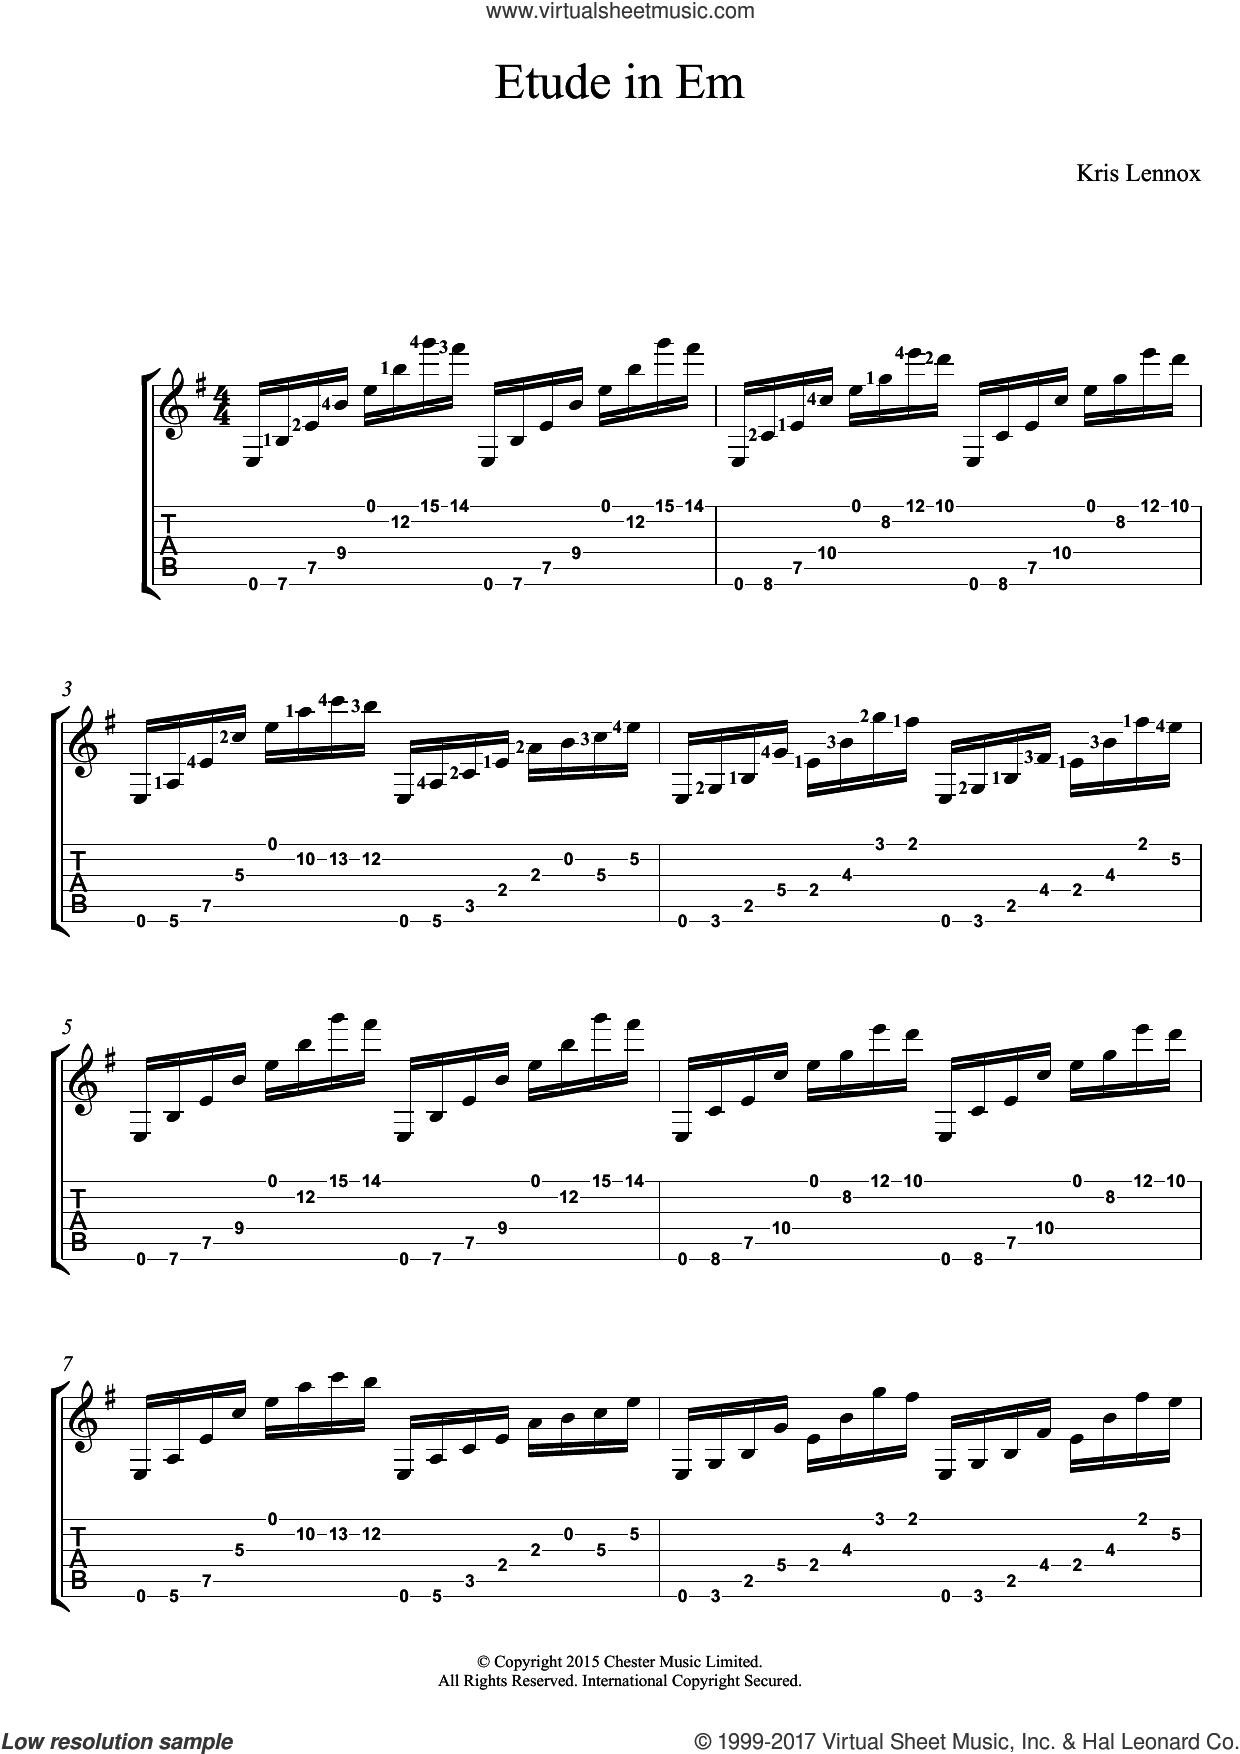 Etude In Em sheet music for guitar (tablature) by Kris Lennox, intermediate skill level